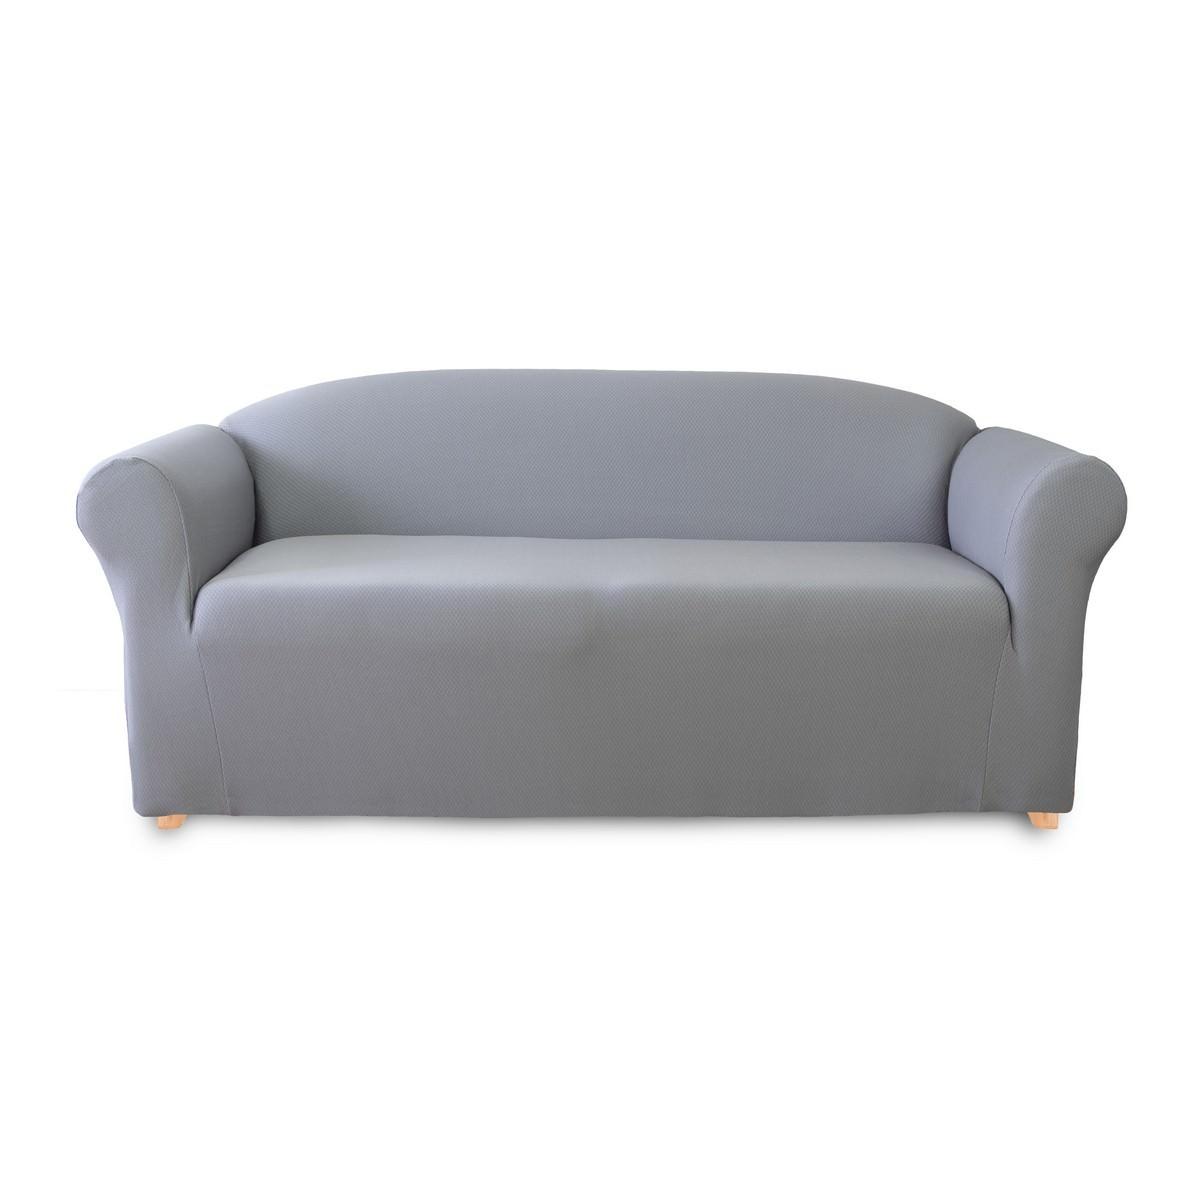 Sure Fit Diamond Sofa Cover, 2 Seater, Silver